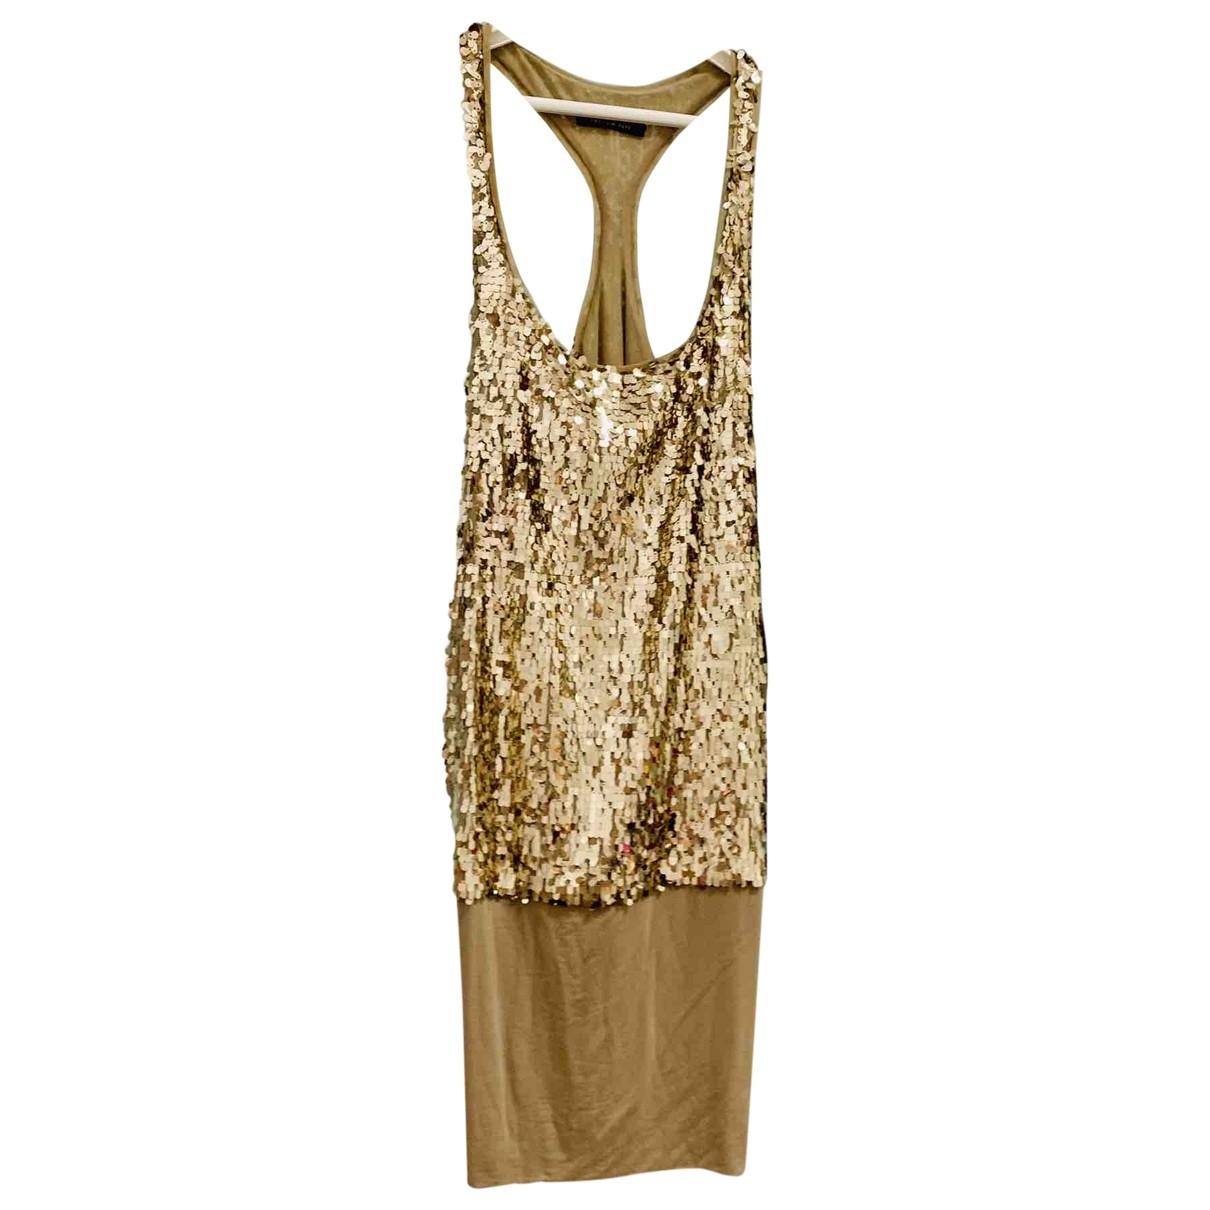 Patrizia Pepe \N Gold Glitter dress for Women 40 IT